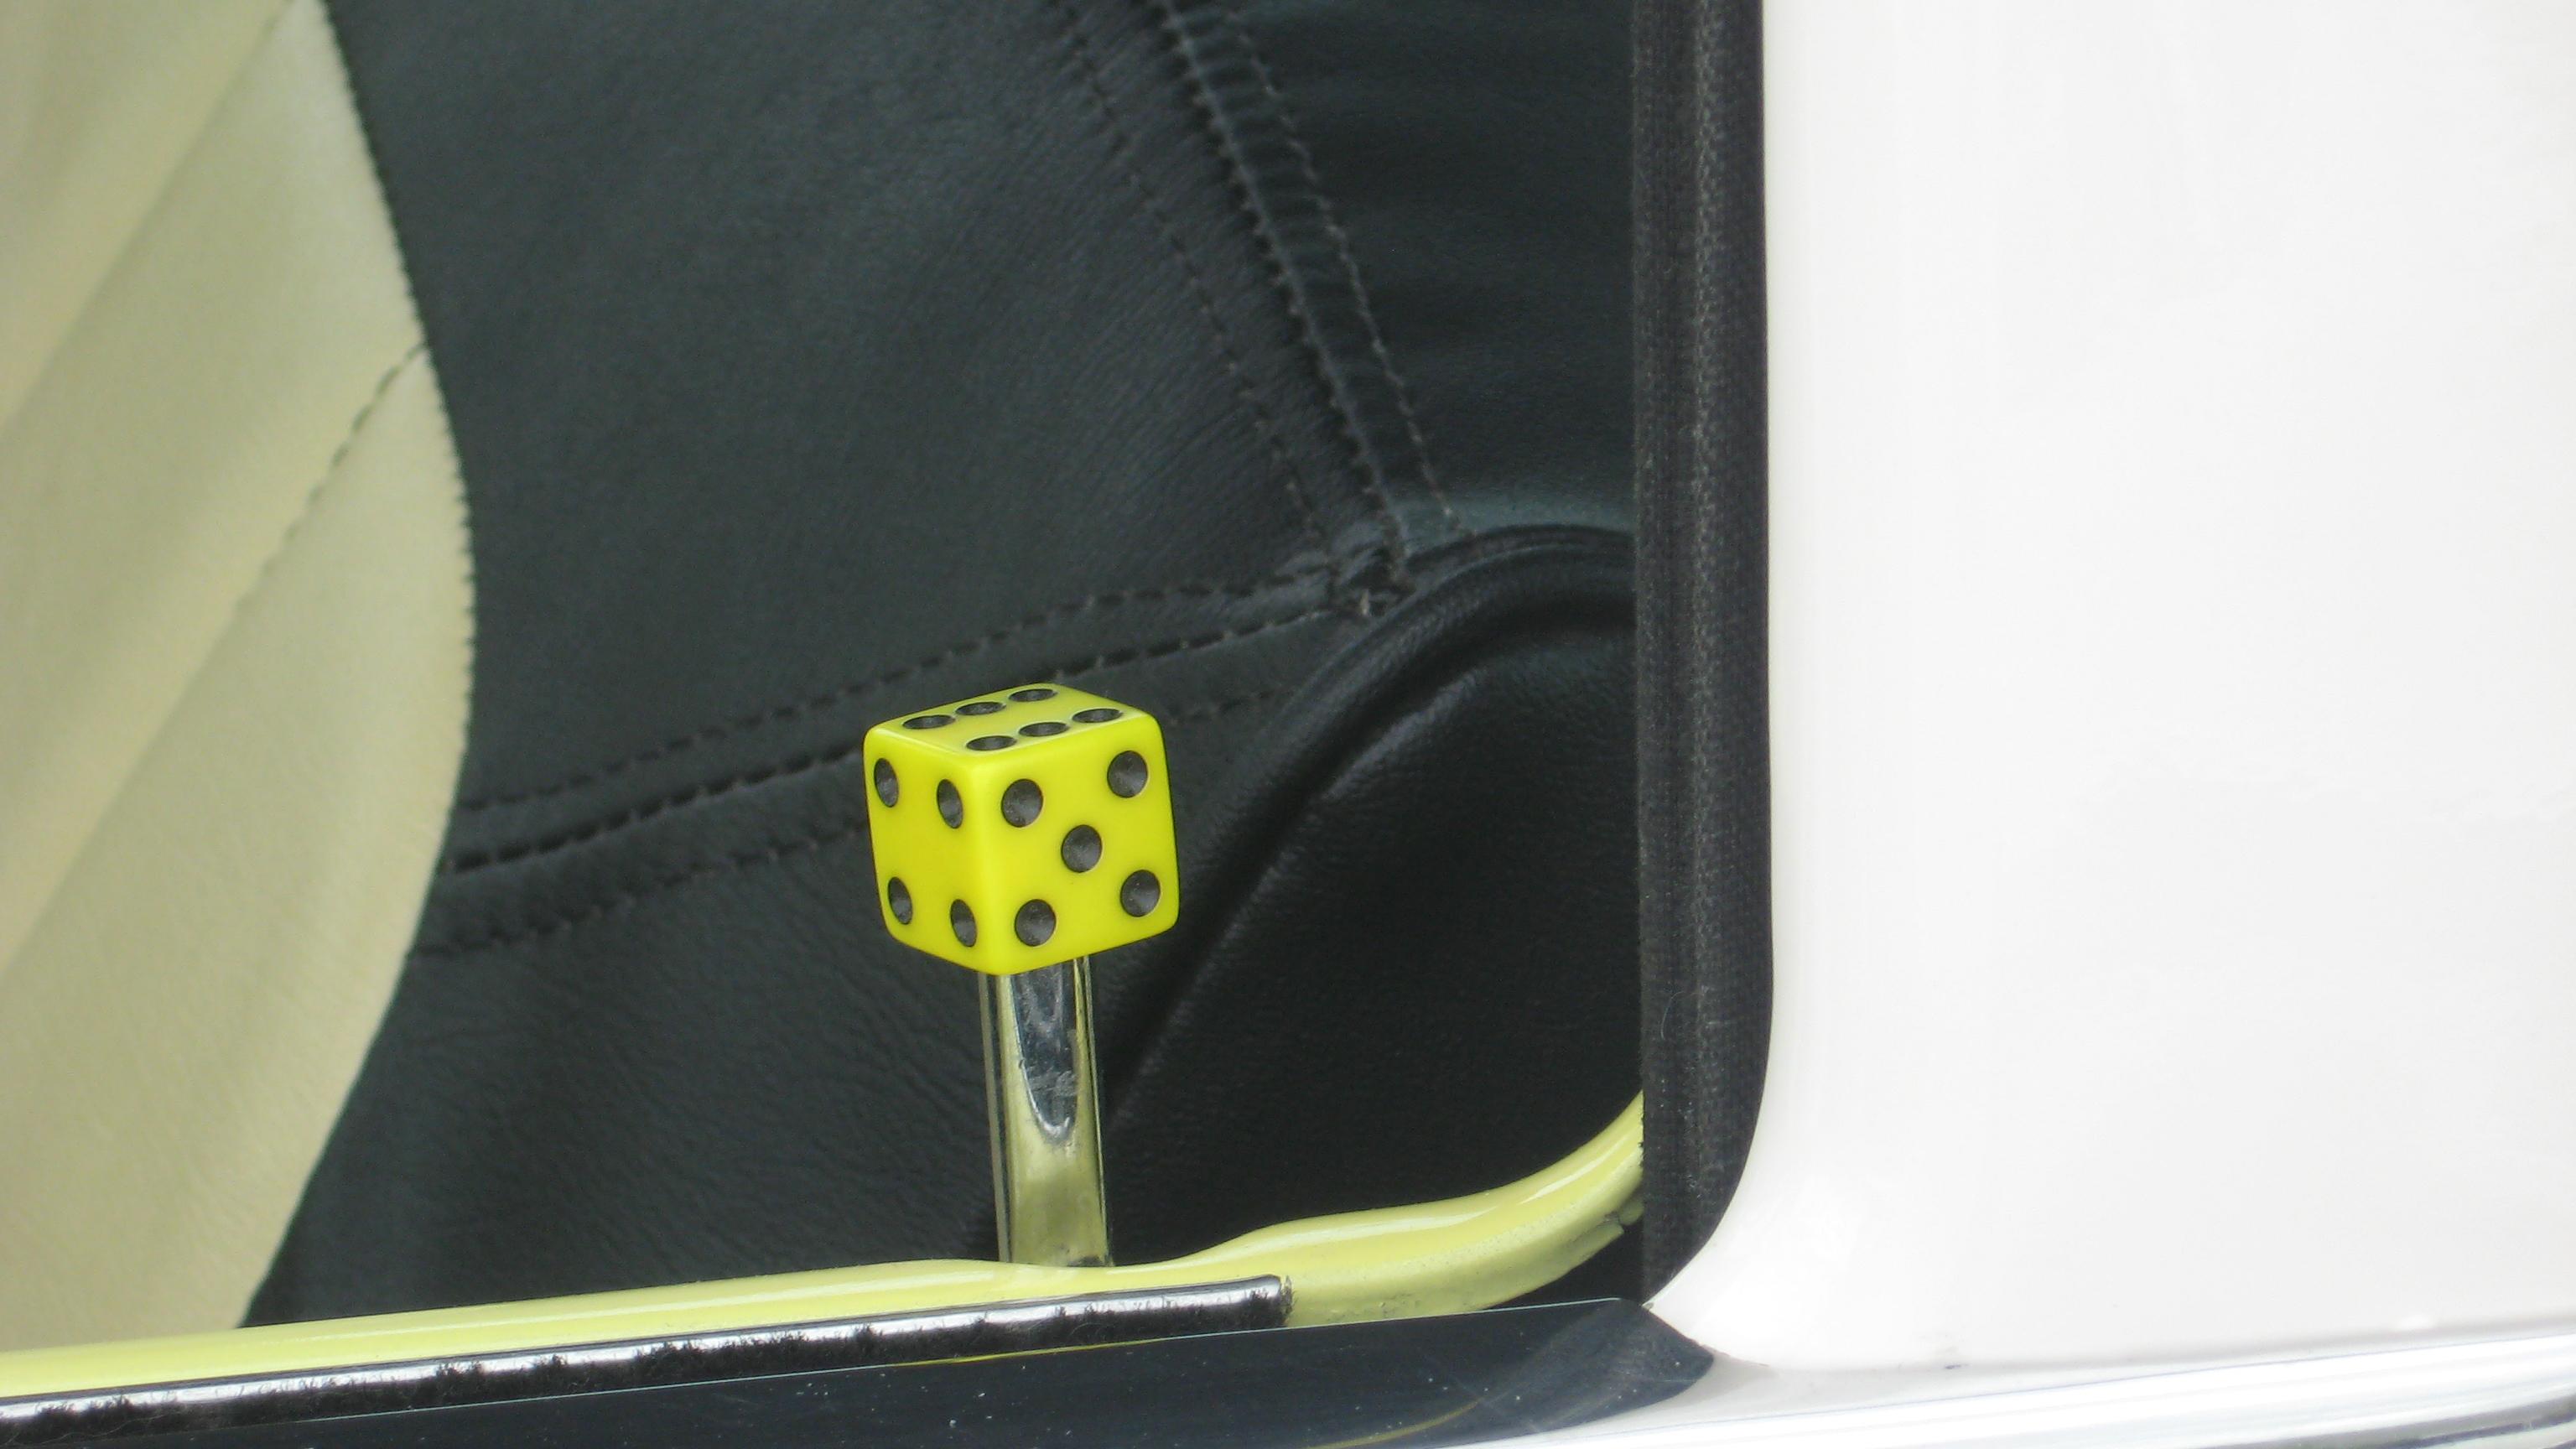 File:Custom door lock knob.jpg - Wikimedia Commons